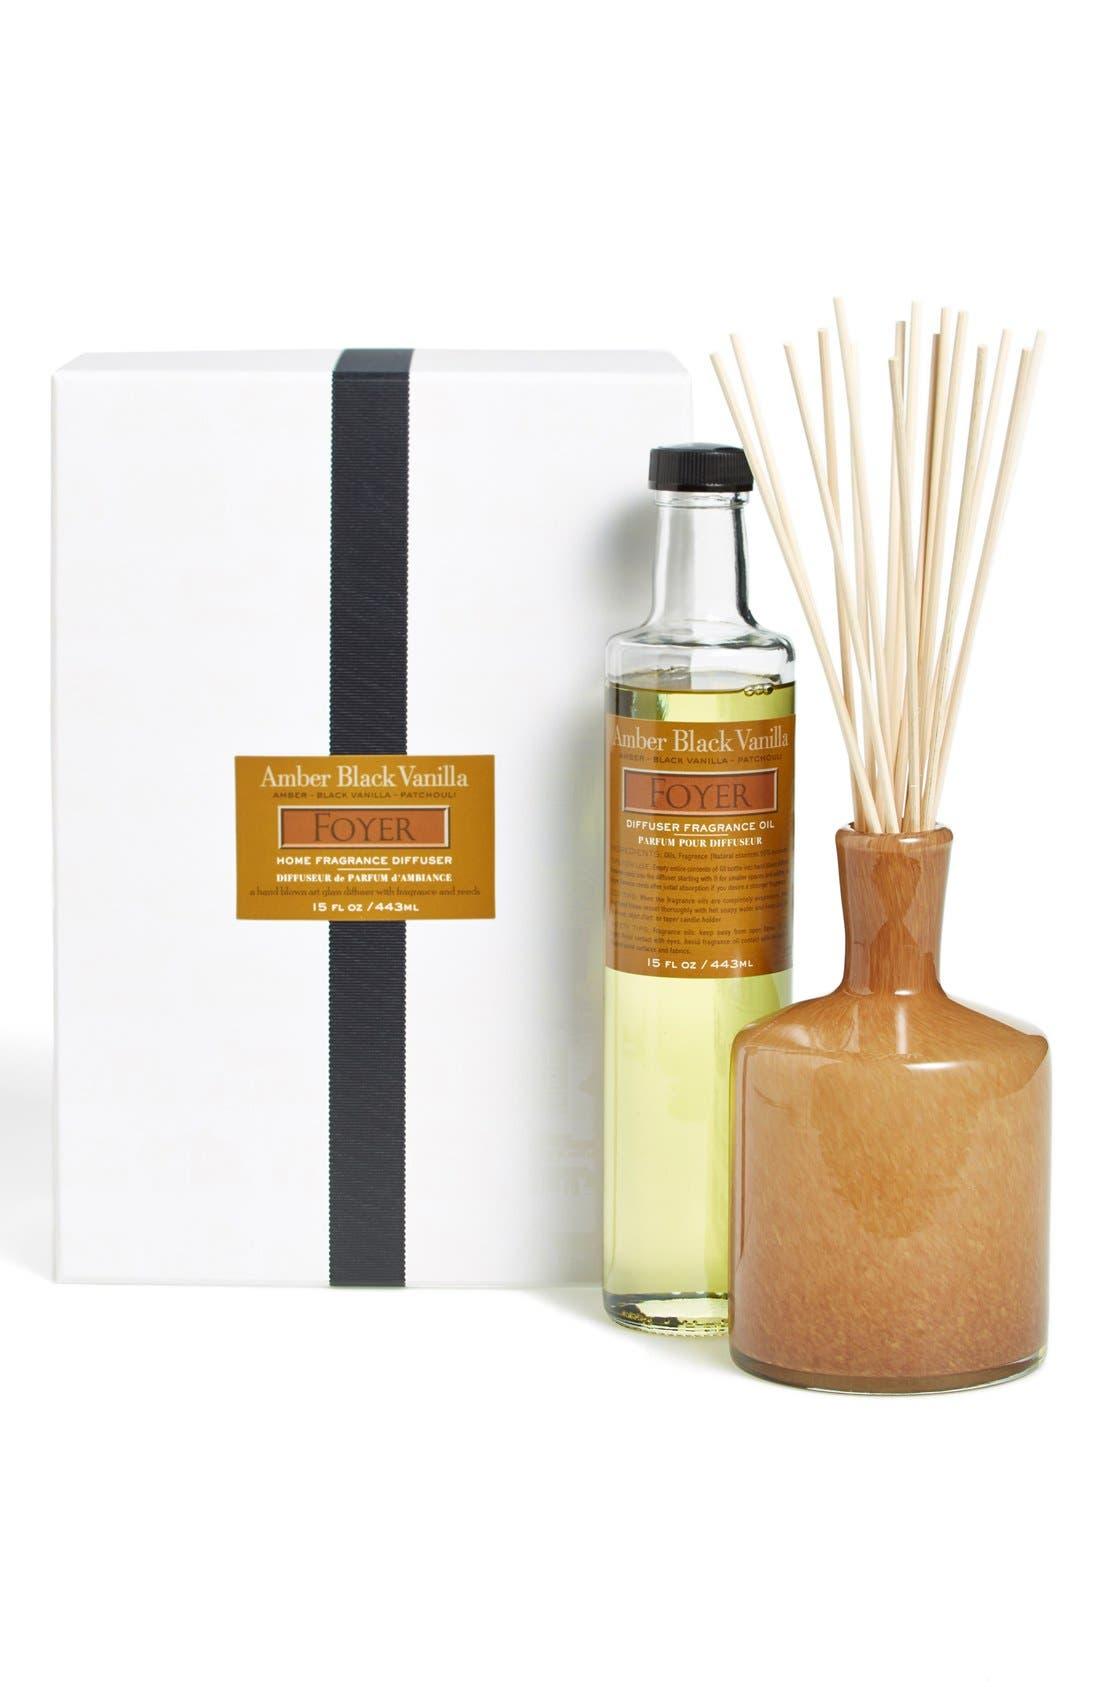 'Amber Black Vanilla - Foyer' Fragrance Diffuser,                             Alternate thumbnail 2, color,                             NO COLOR